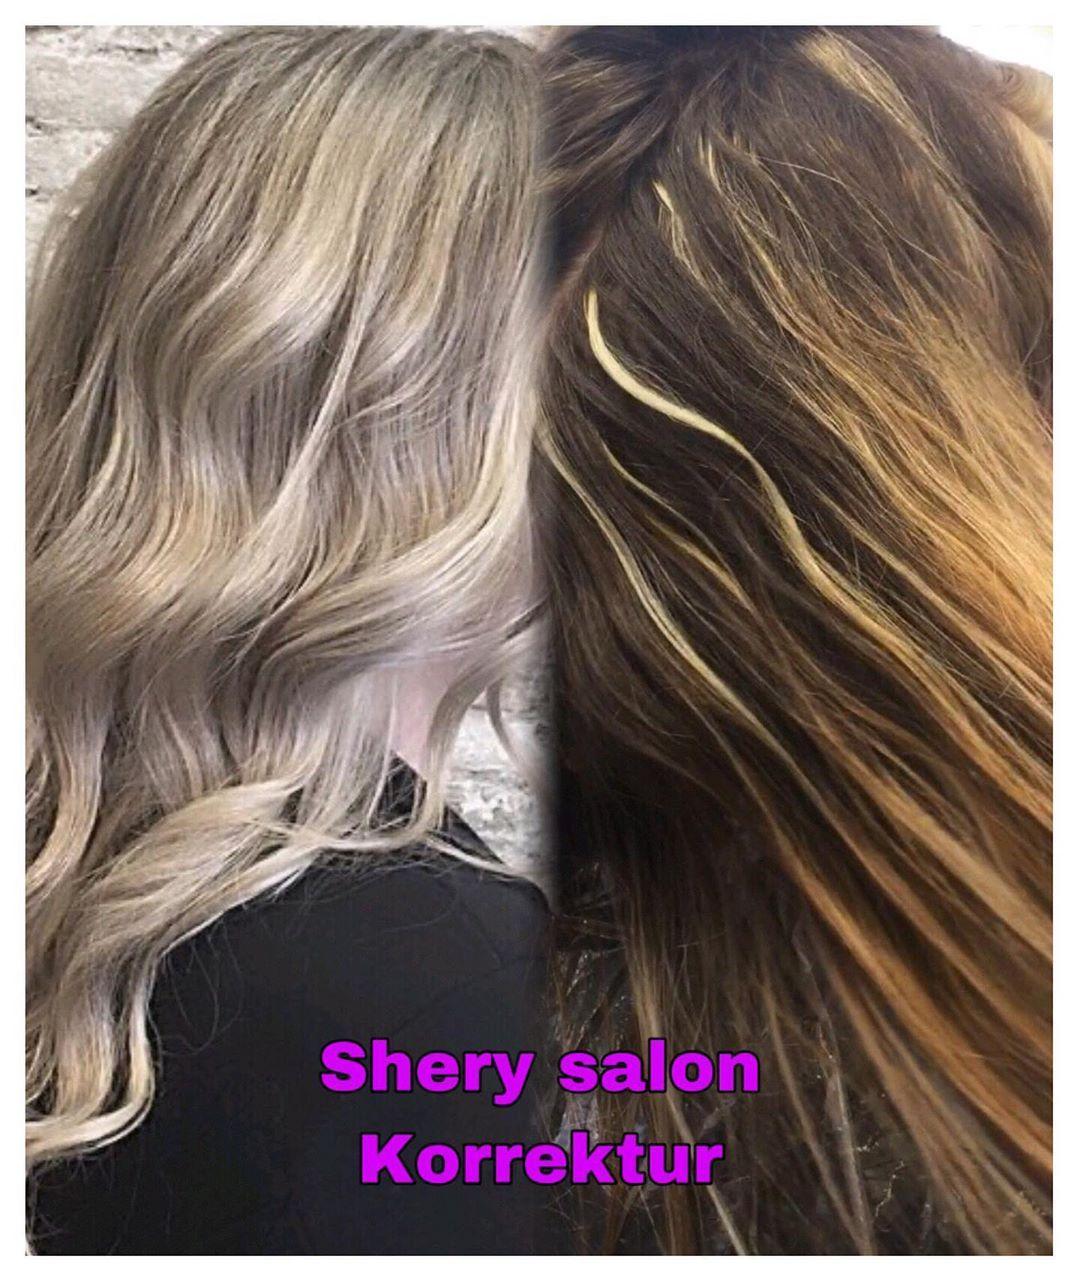 Shery Salon Westenhellweg 127 44137 Dortmund Tel 0049 231 20637127 9 Frisur Long Hair Styles Hair Styles Salons